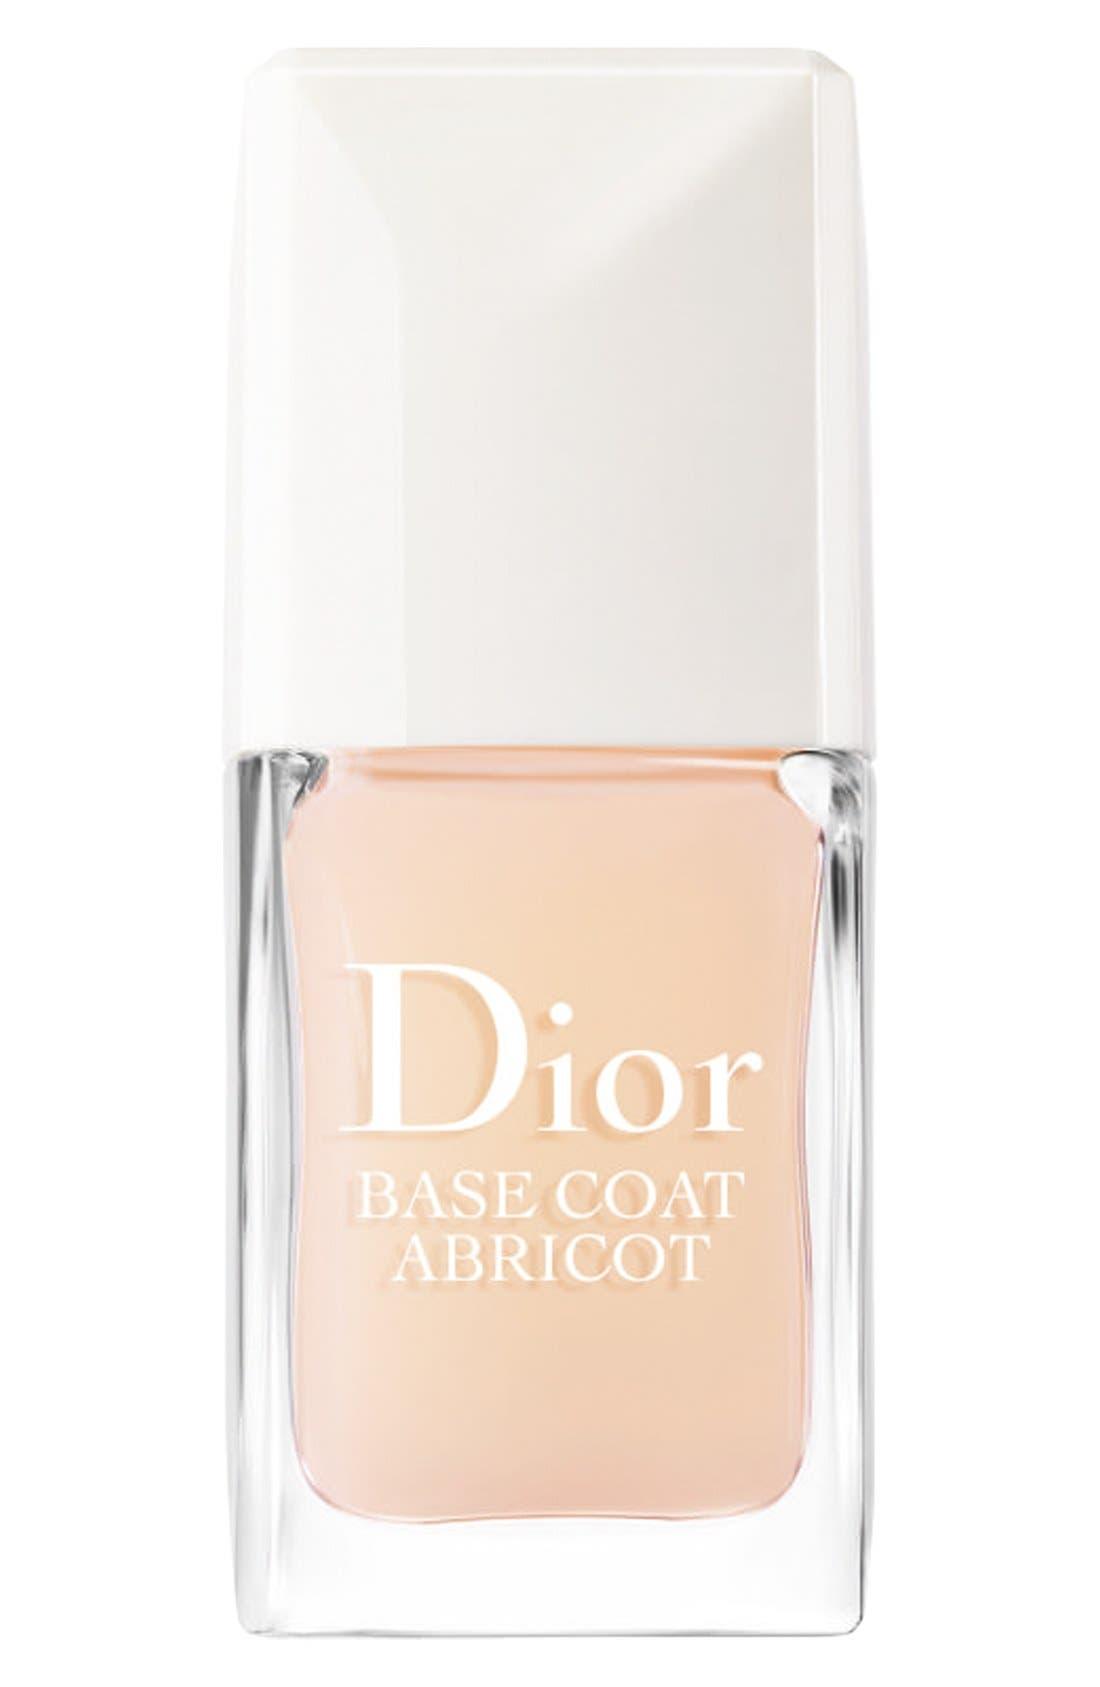 Dior Creme Abricot Base Coat -